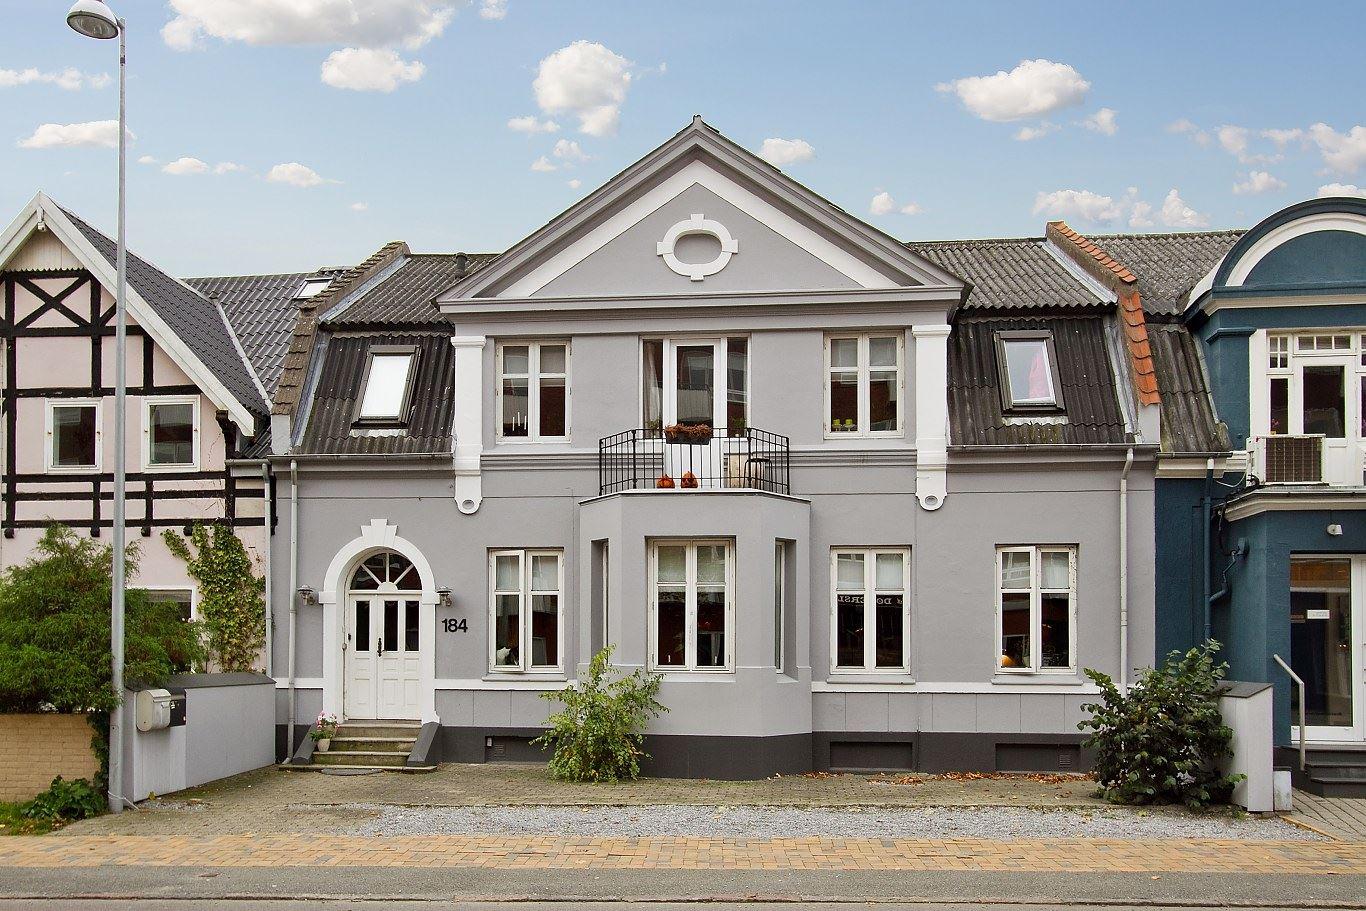 Skibhusvej 184, st., 5000 Odense C